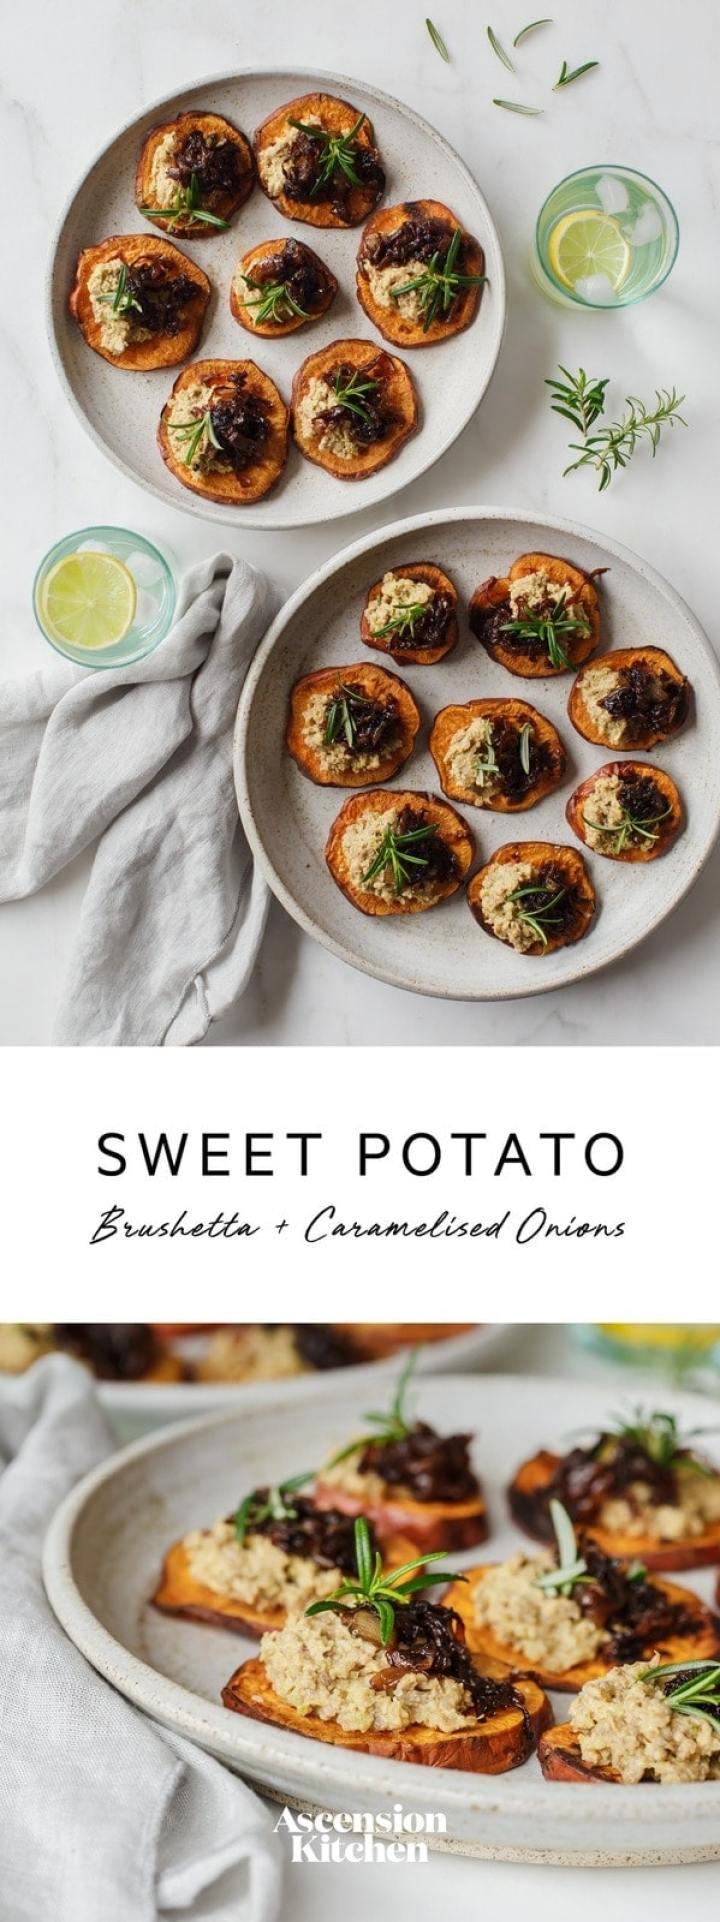 Sweet Potato Bruschetta with Caramelised Onion